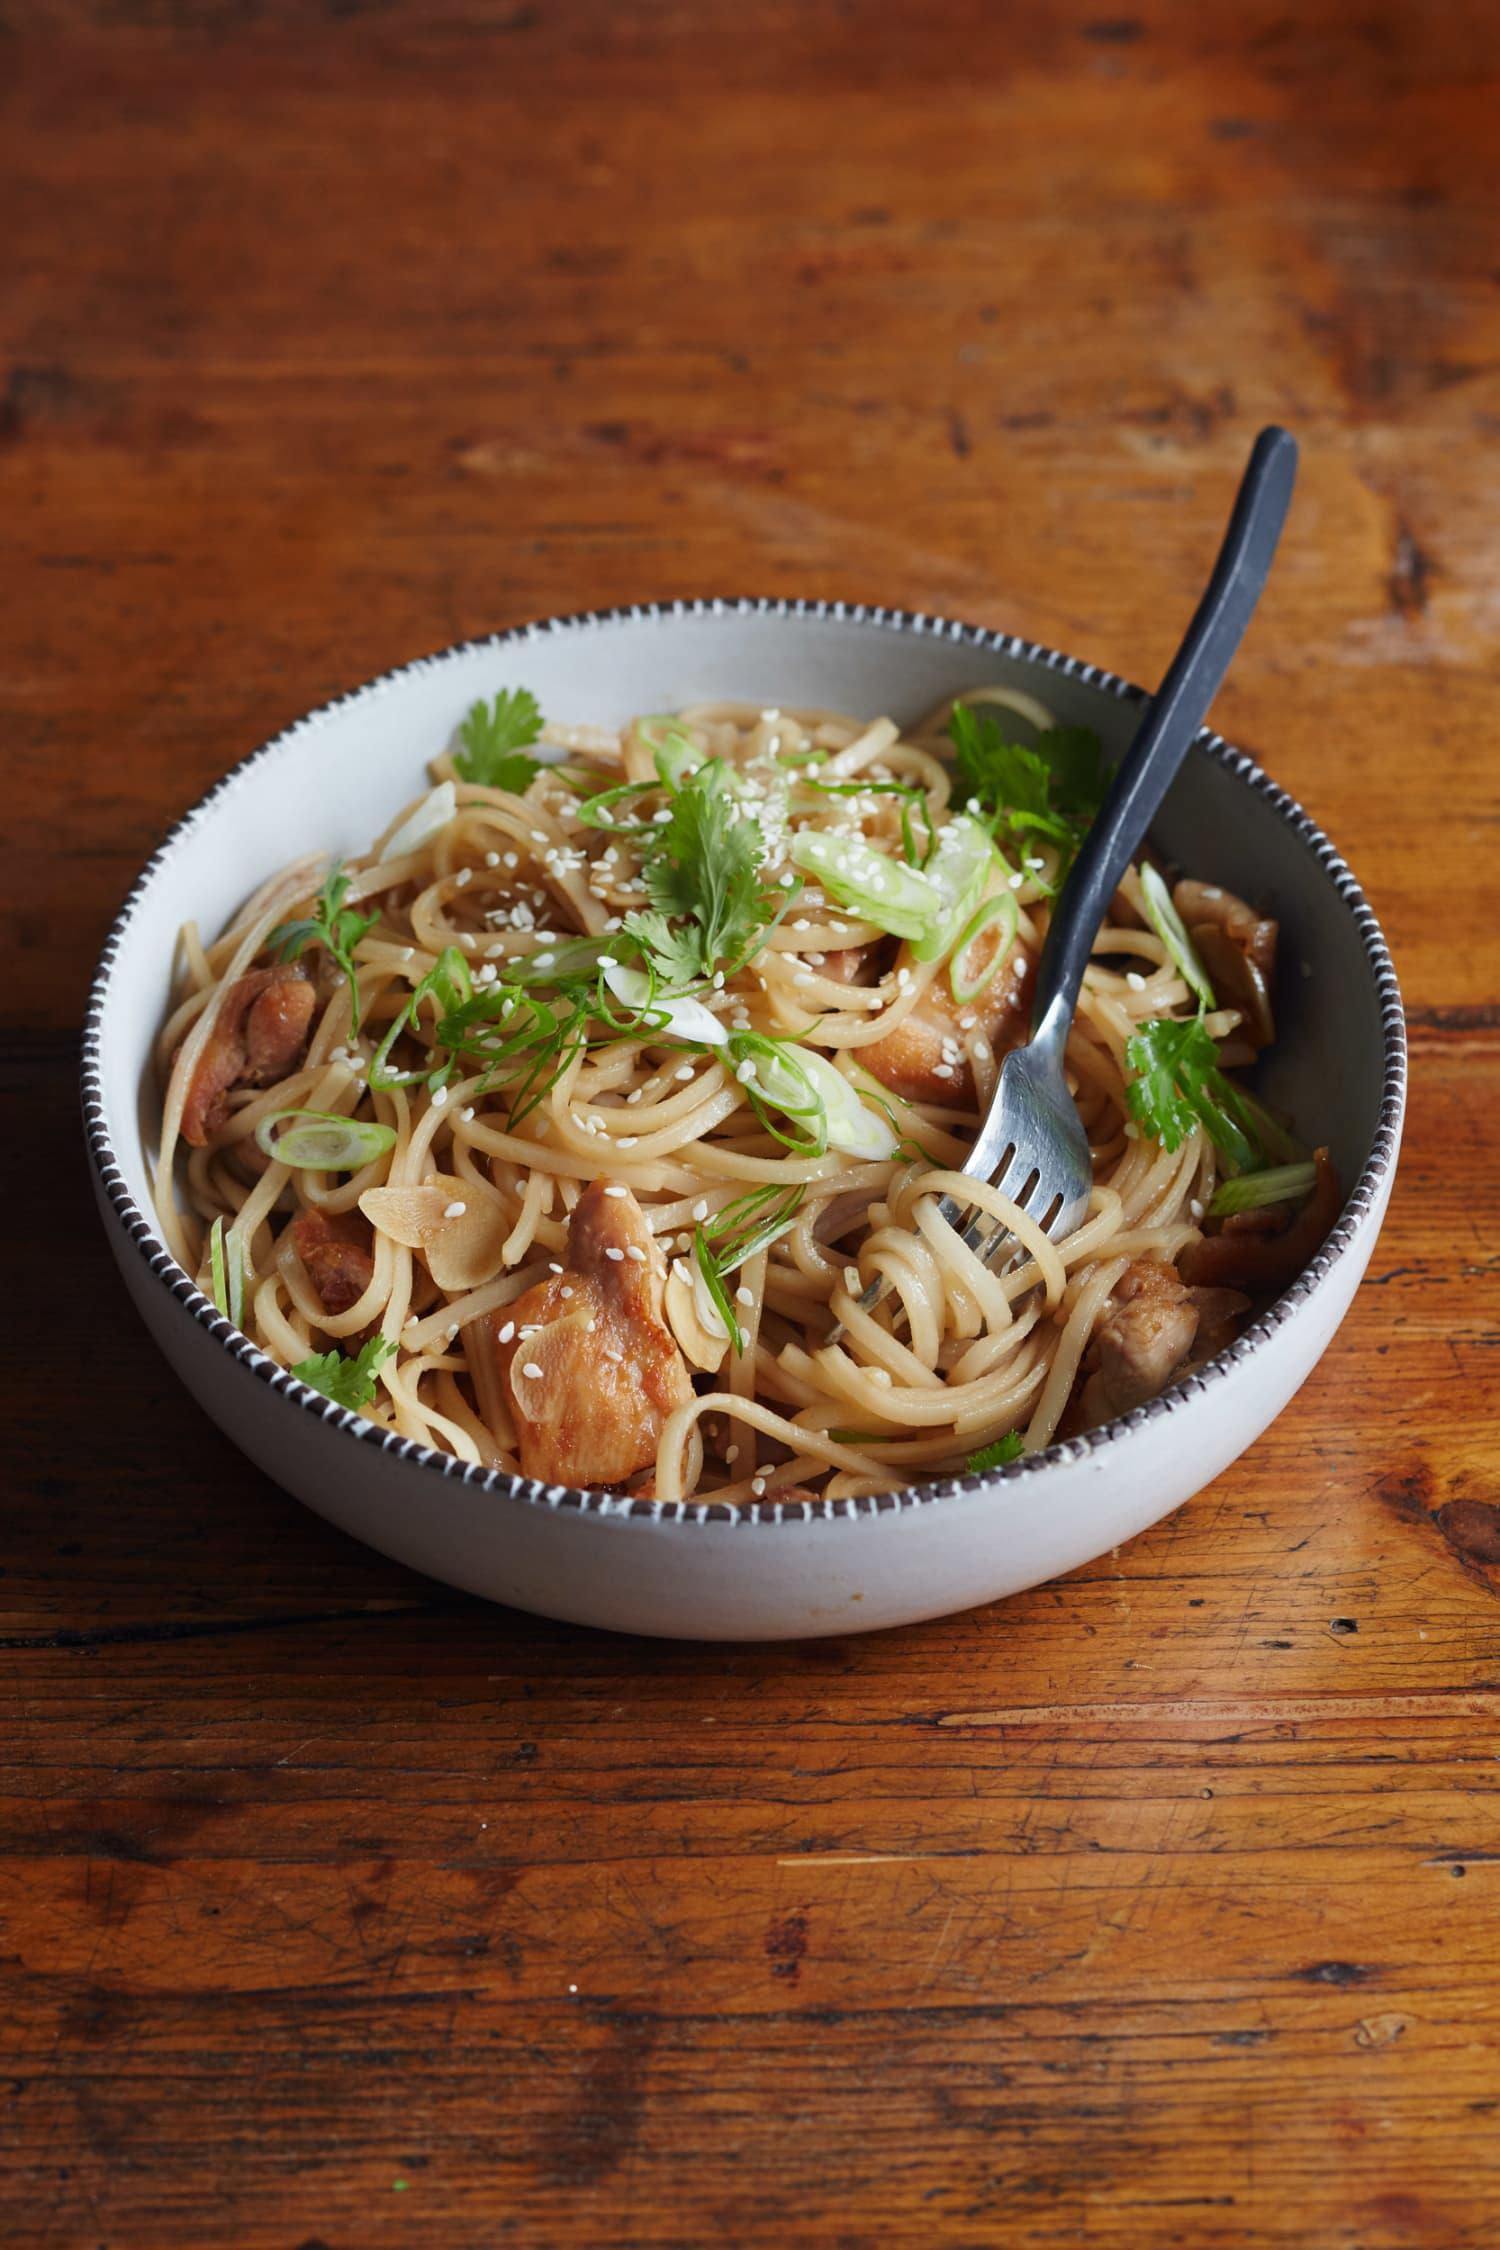 Recipe: Sesame Chicken Noodle Bowl